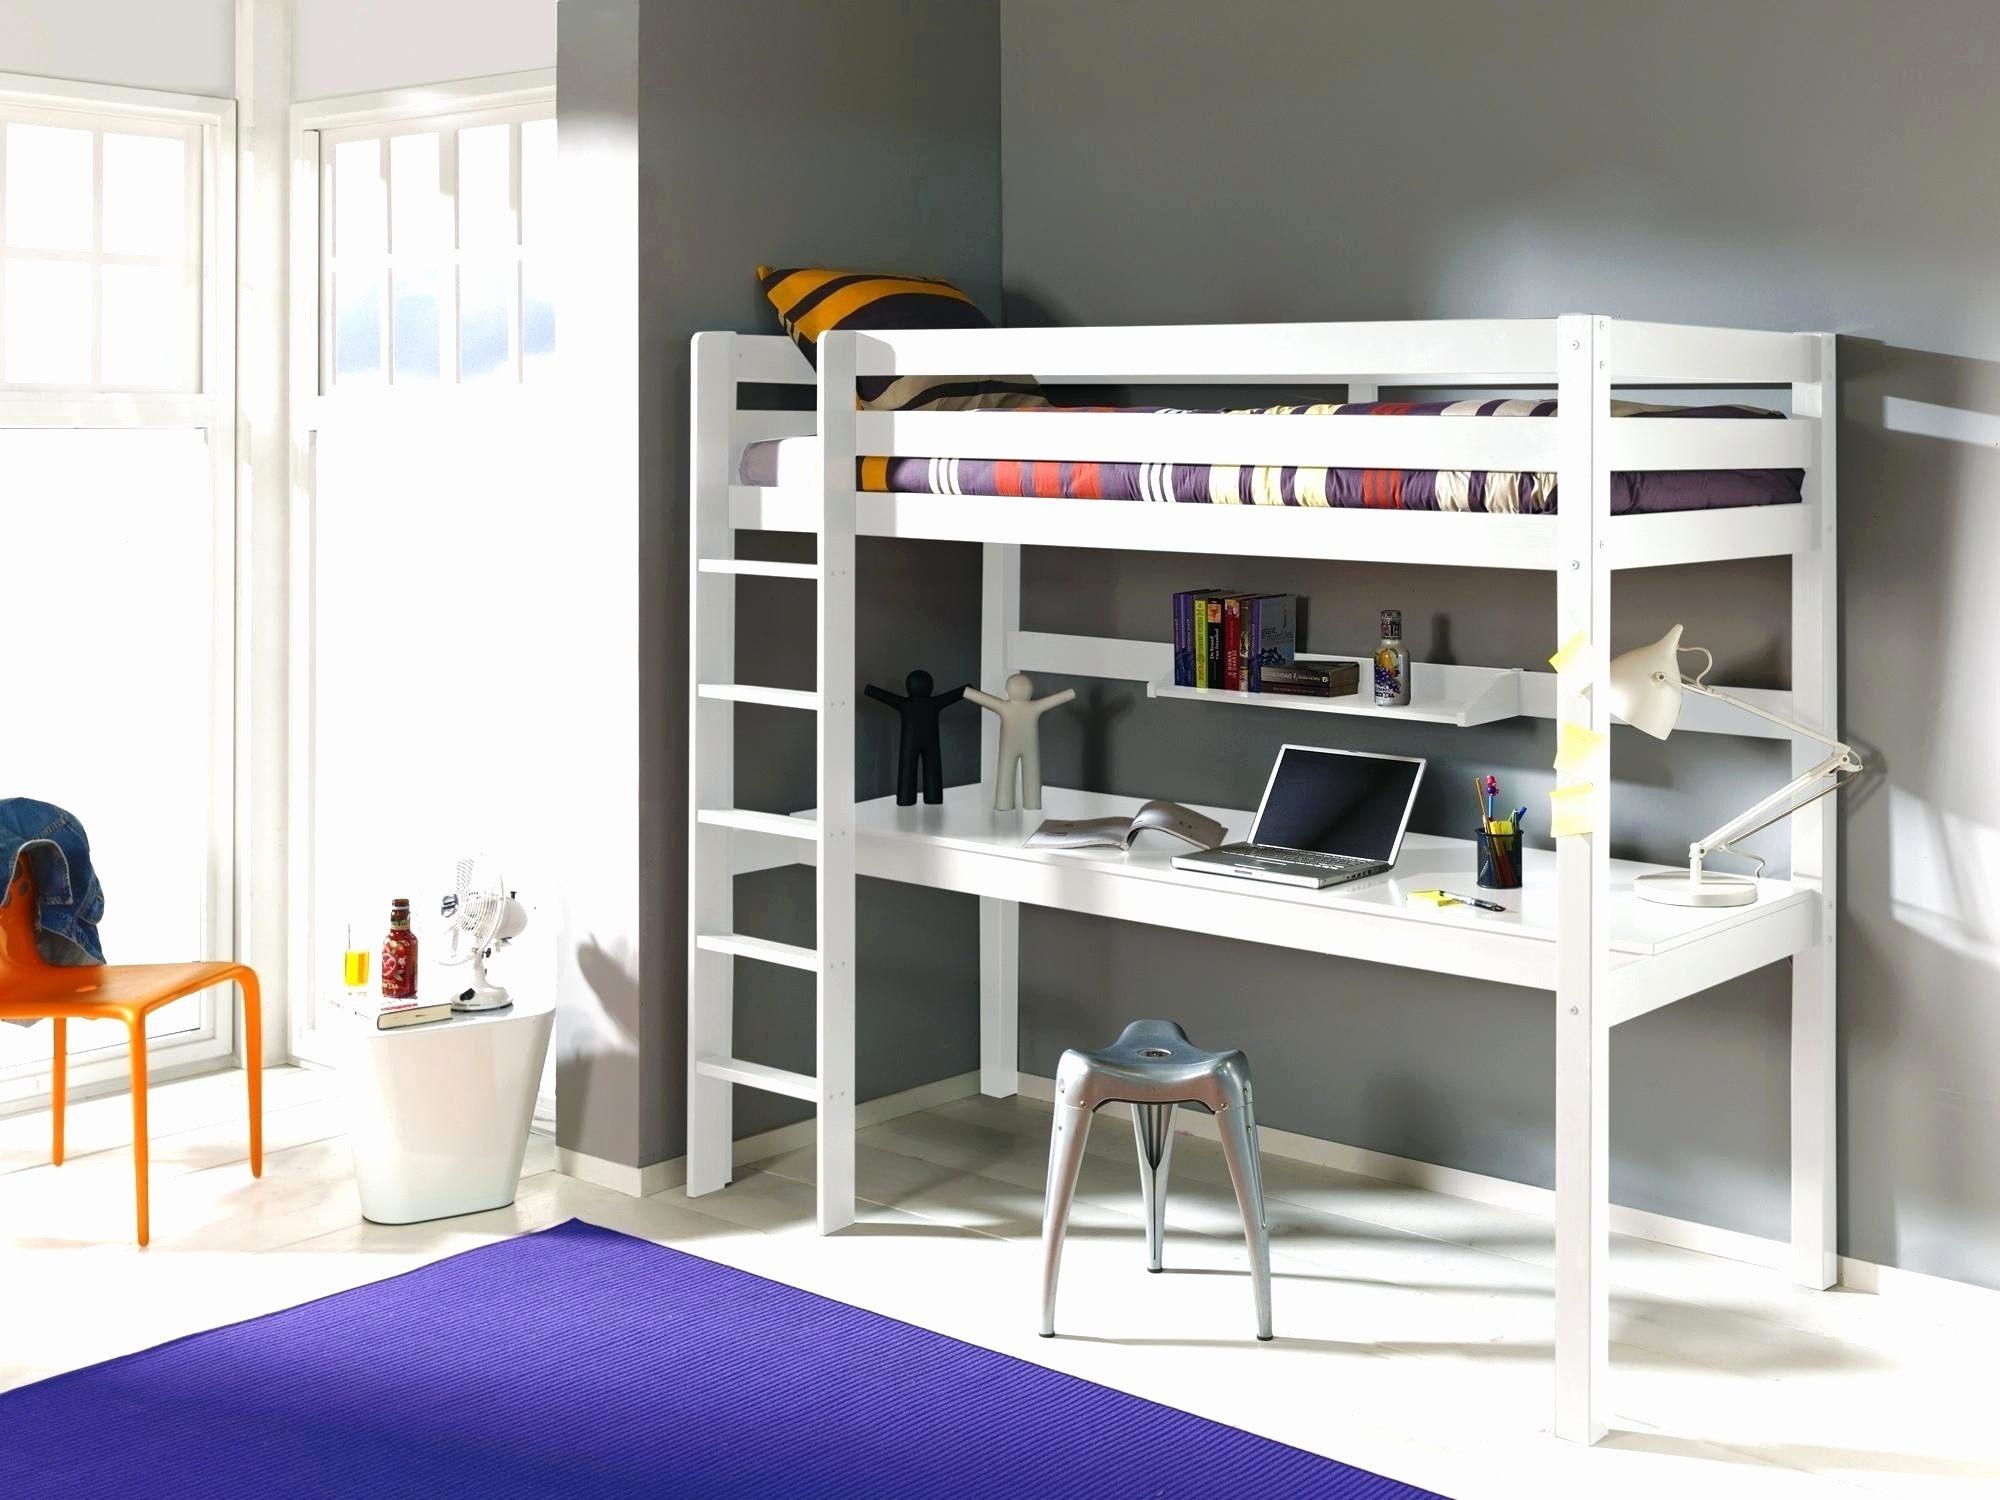 Lit Mezzanine 120 Joli Lit Mezzanine Design Mezzanine Industrielle Elegant Lit Design Pas